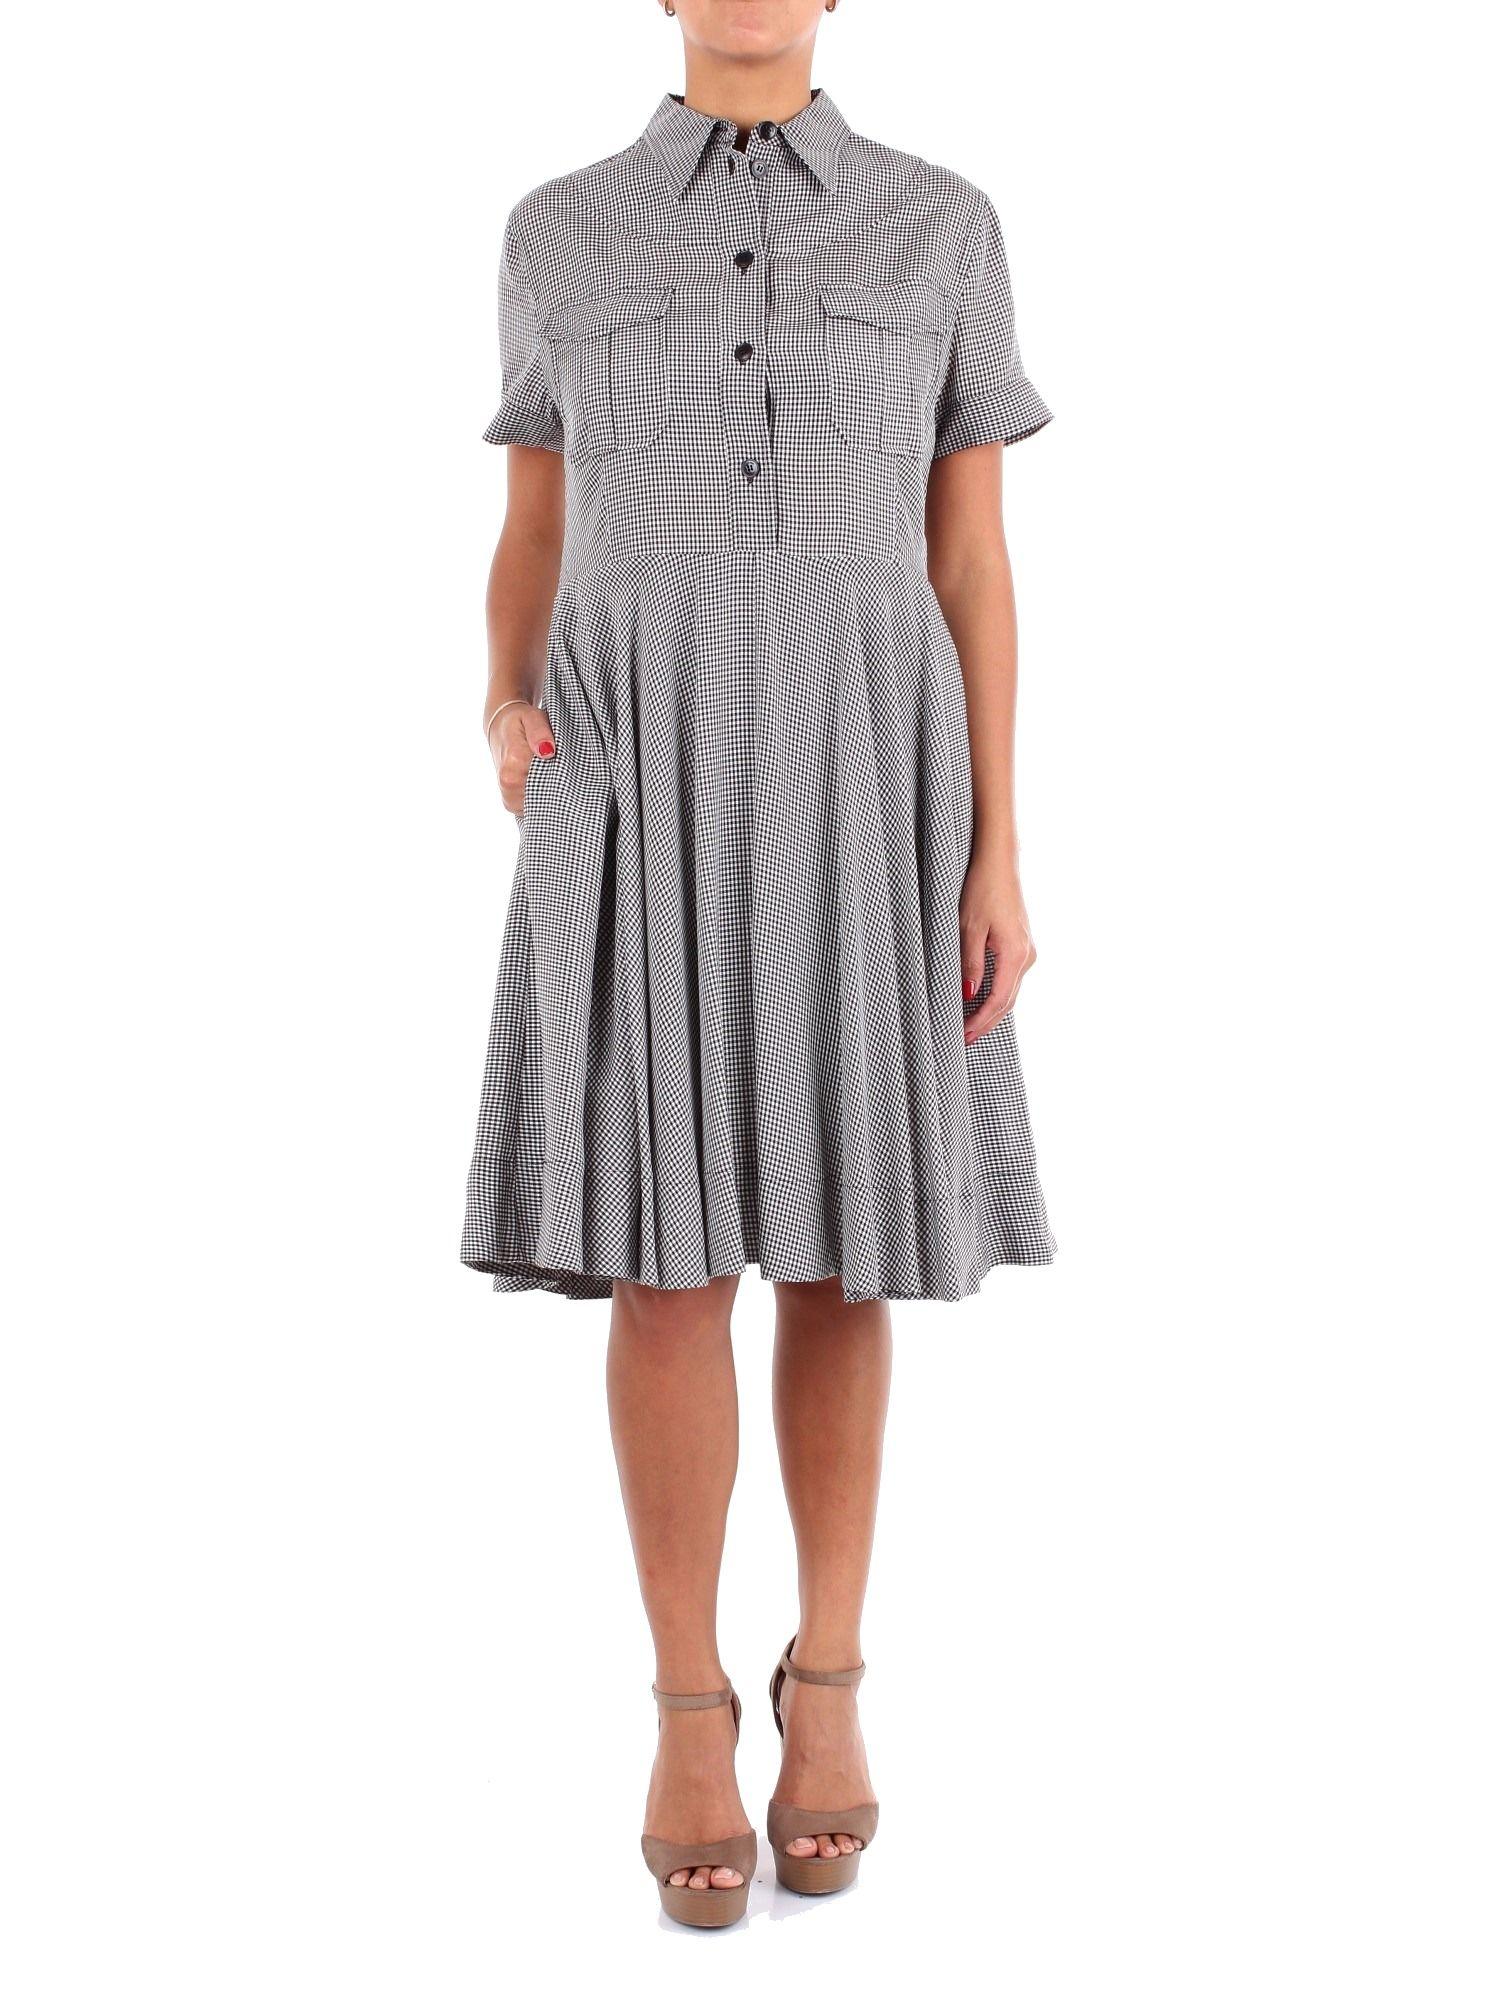 Calvin Klein Black Viscose Dress